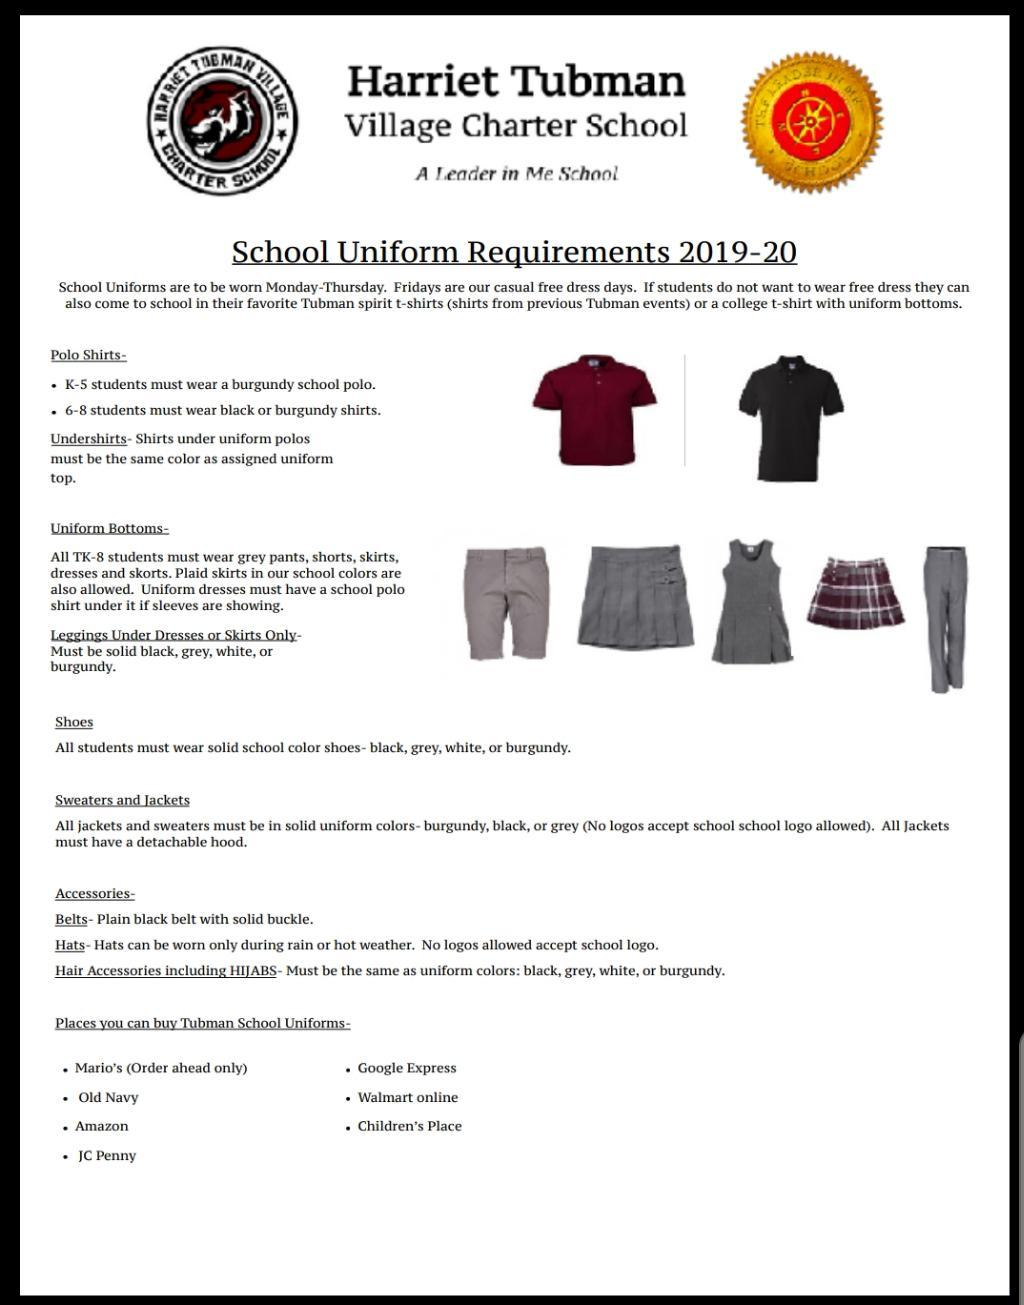 Dress Code Policy Student Handbook Dress Code Policy Harriet Tubman Village Charter School [ 1305 x 1024 Pixel ]